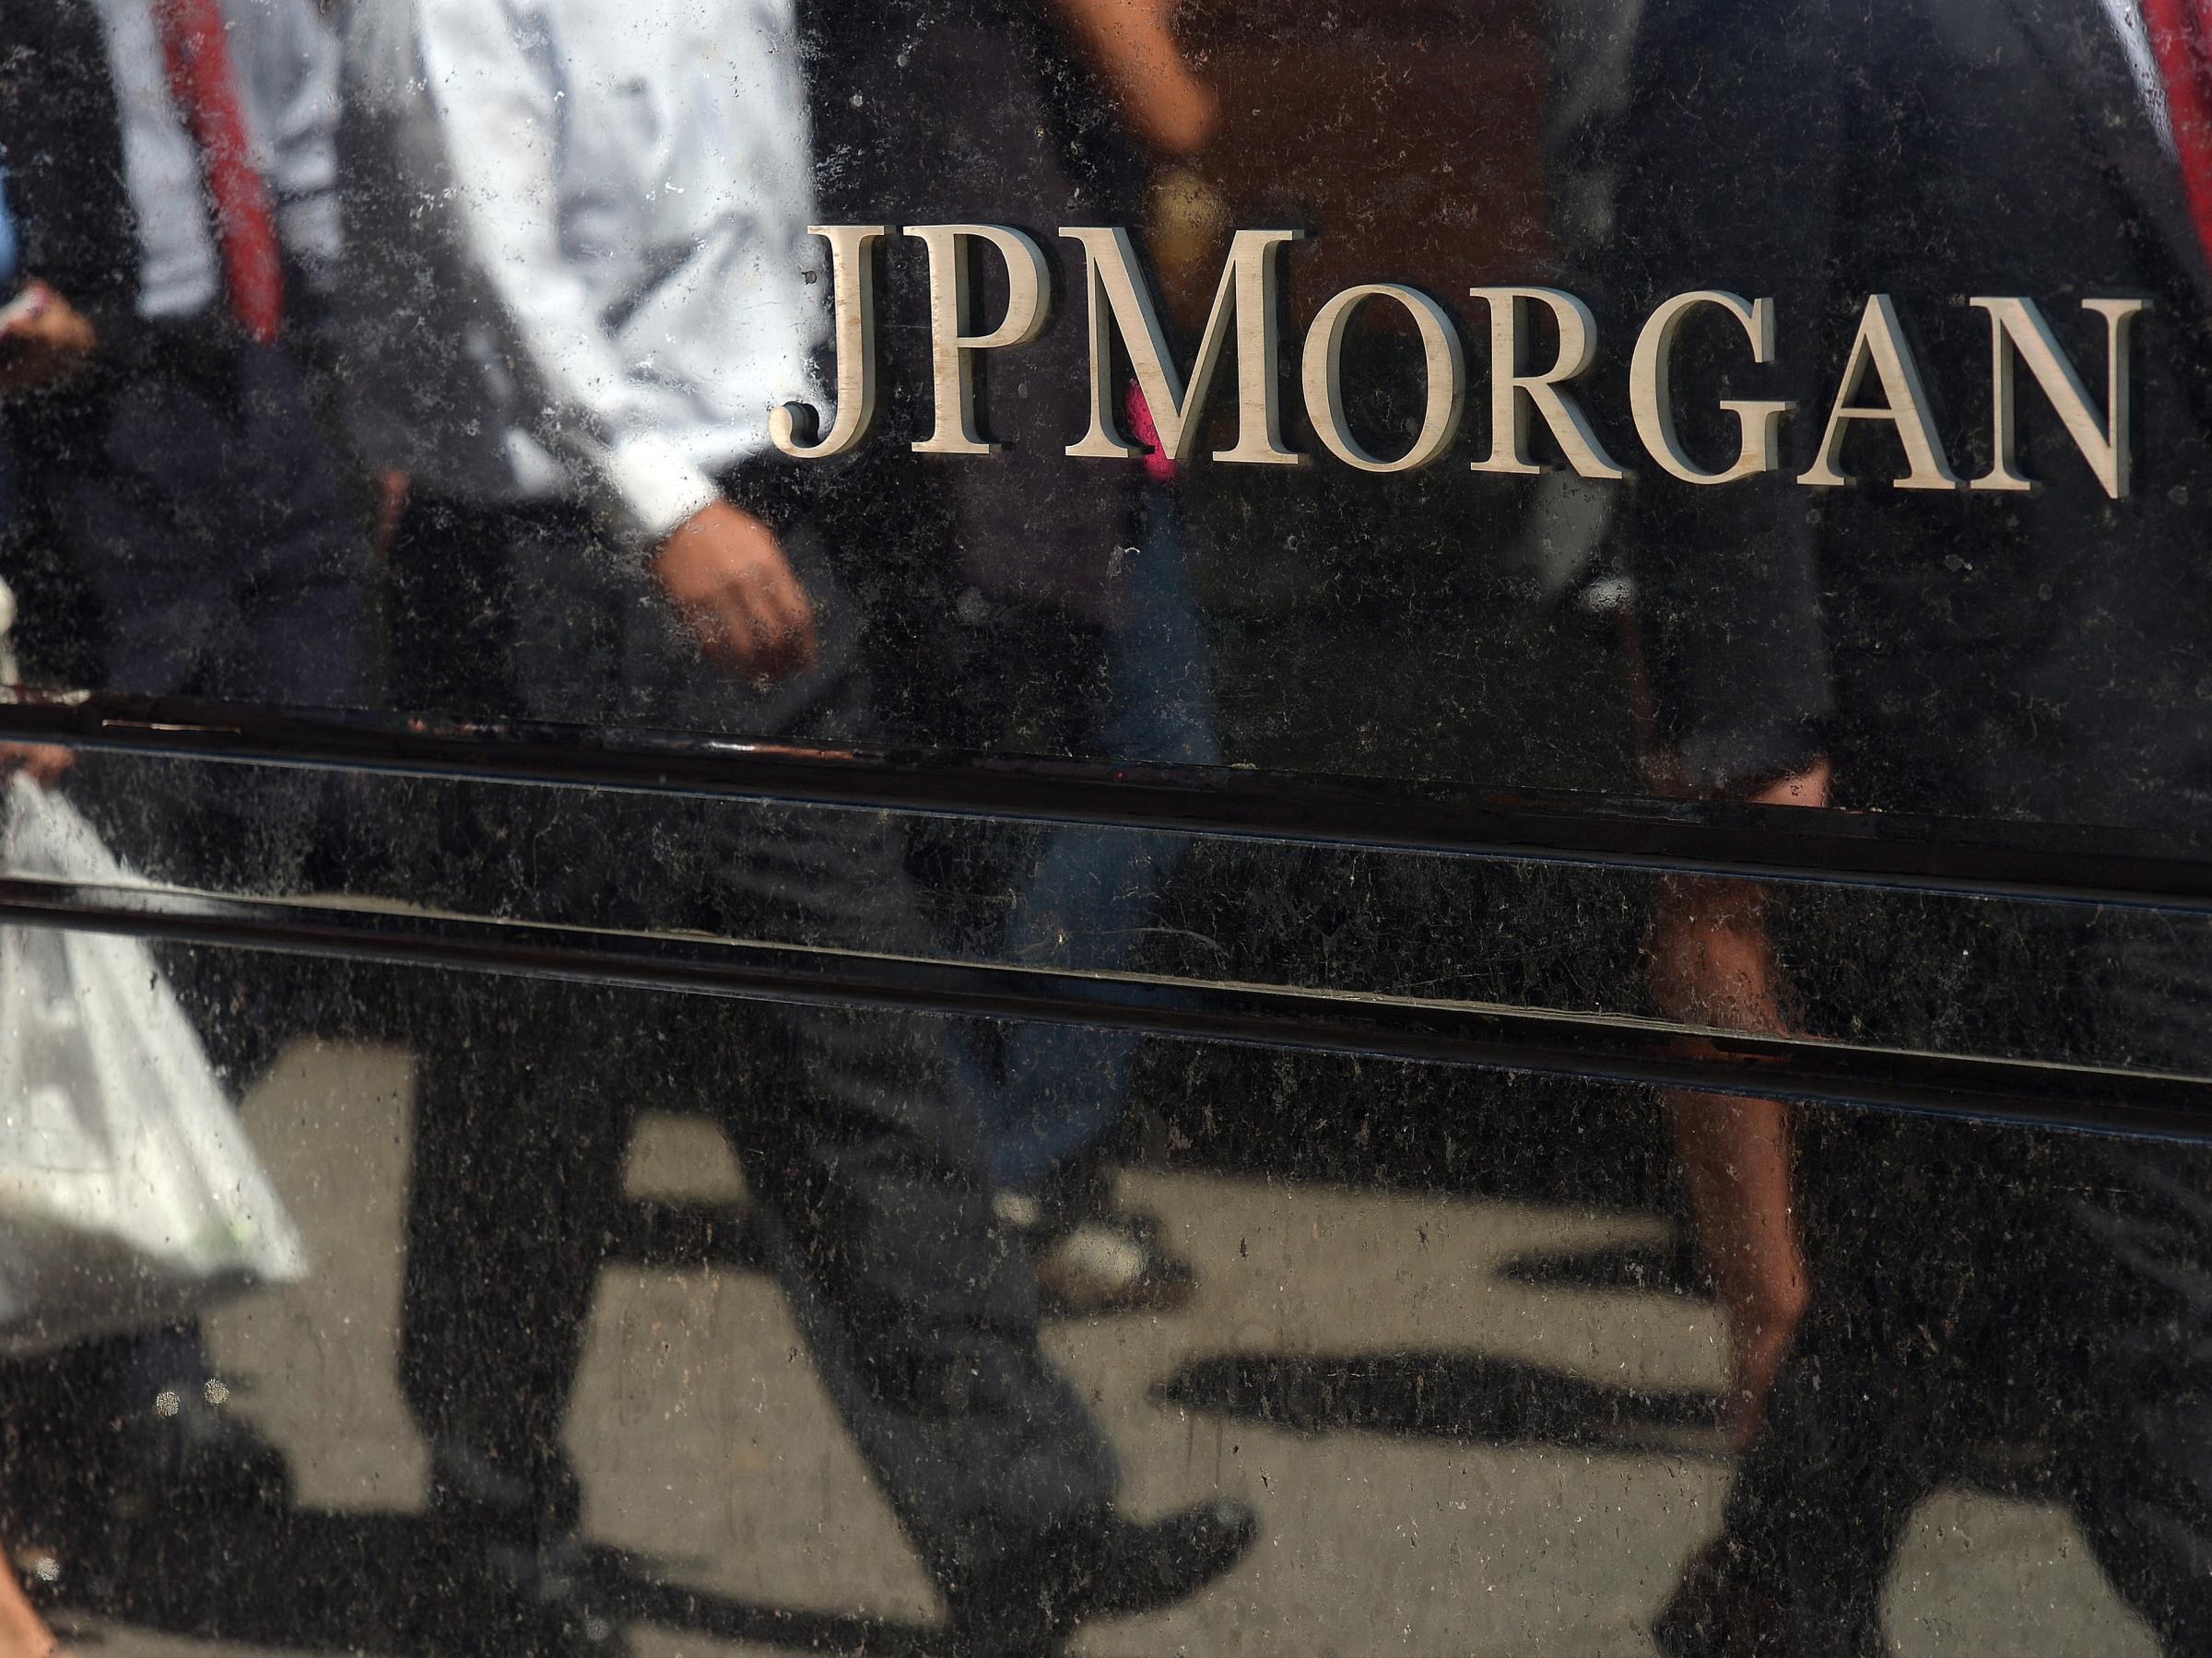 Jpmorgan Chase Mortgage Backed Securities